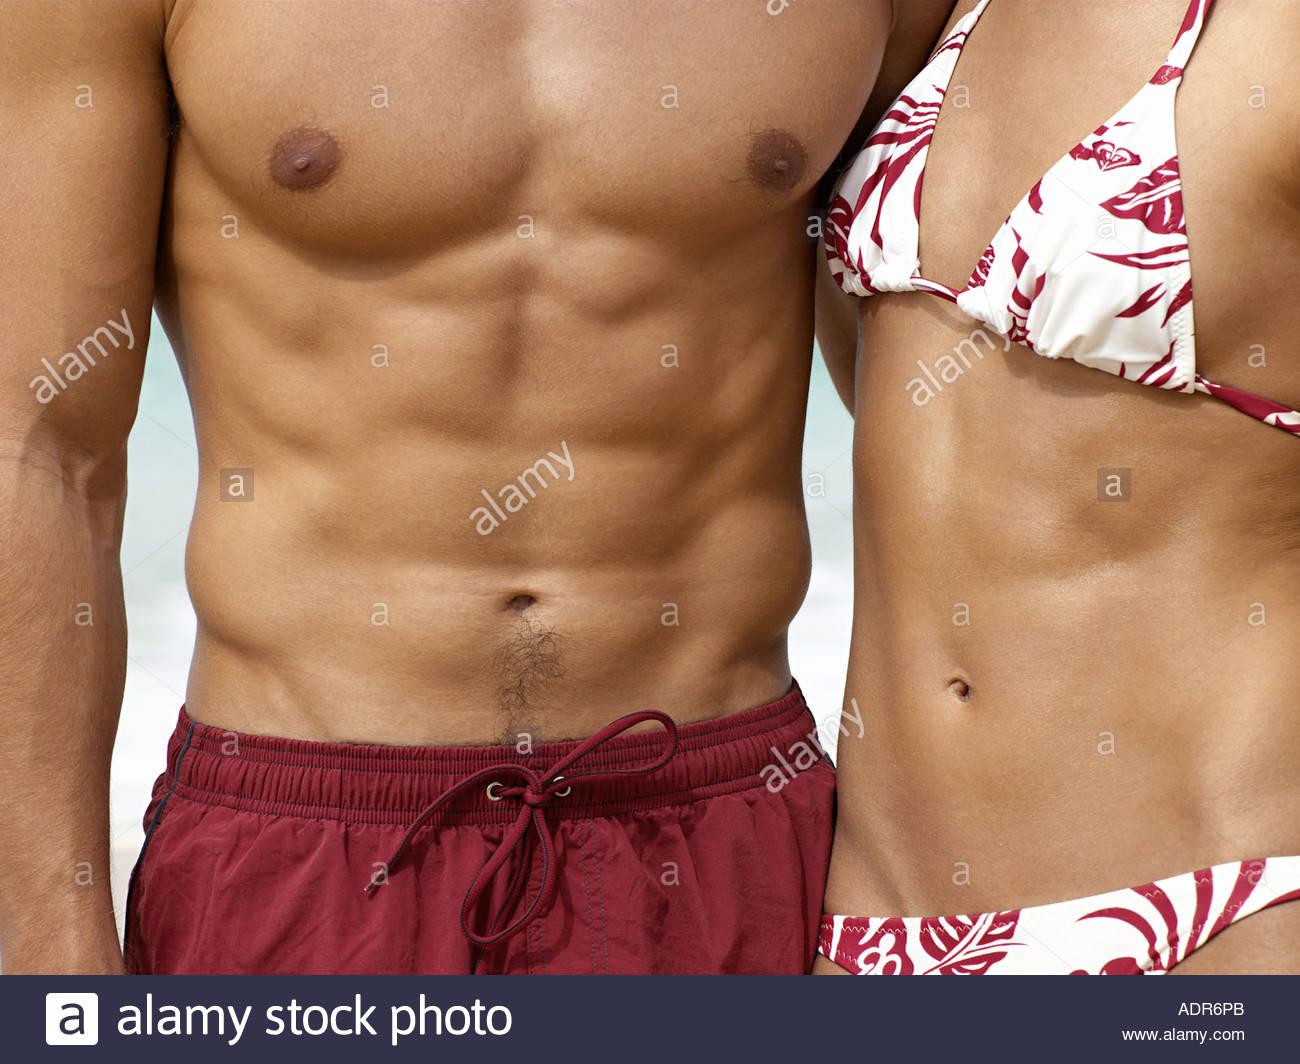 Healthy couple wearing swimwear - Stock Image